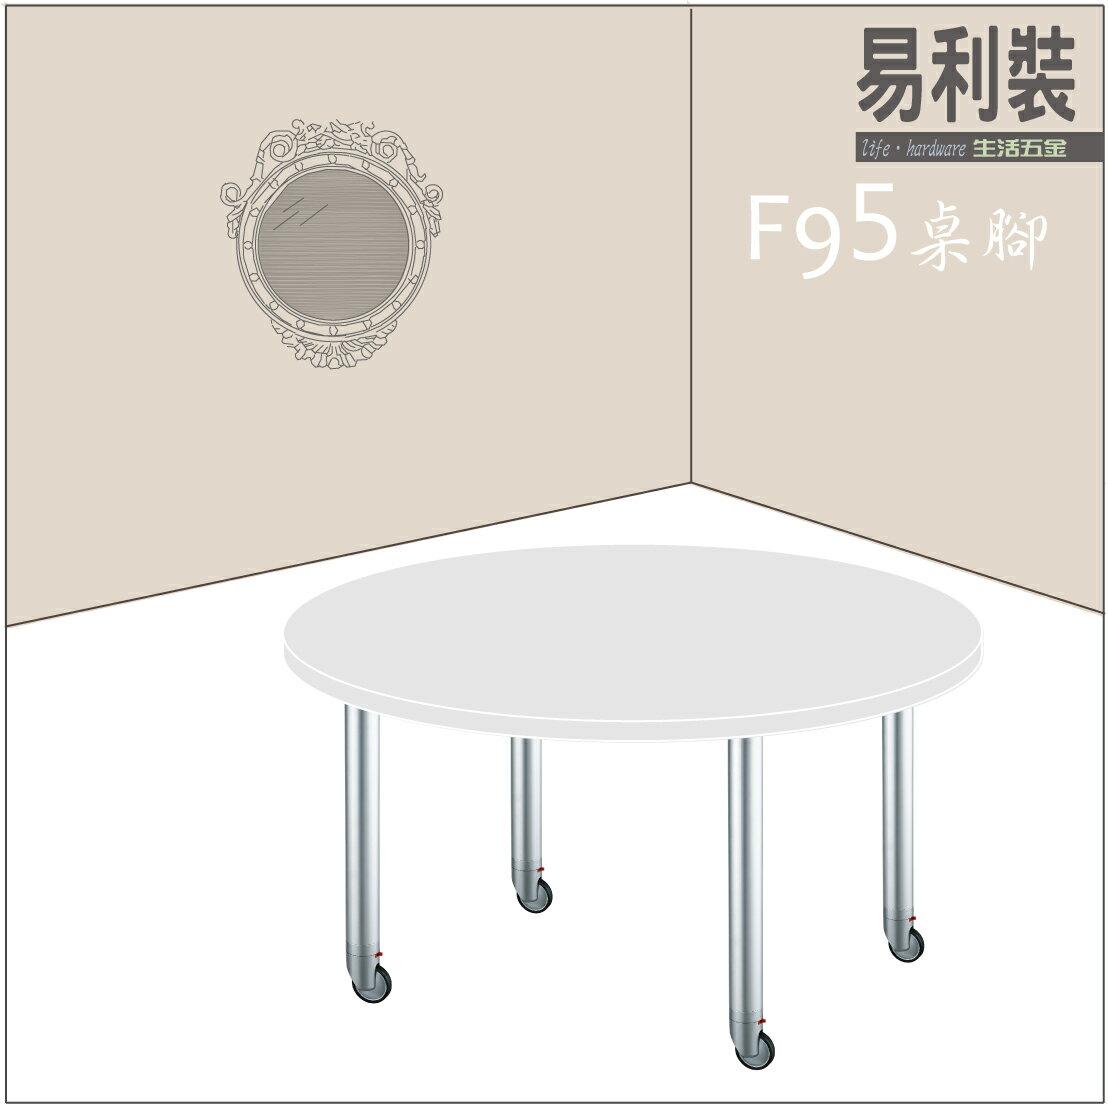 【 EASYCAN  】F95 餐桌腳 易利裝生活五金 書桌腳 玩具桌腳 工作桌腳 房間 臥房 衣櫃 小資族 辦公家具 系統家具 0